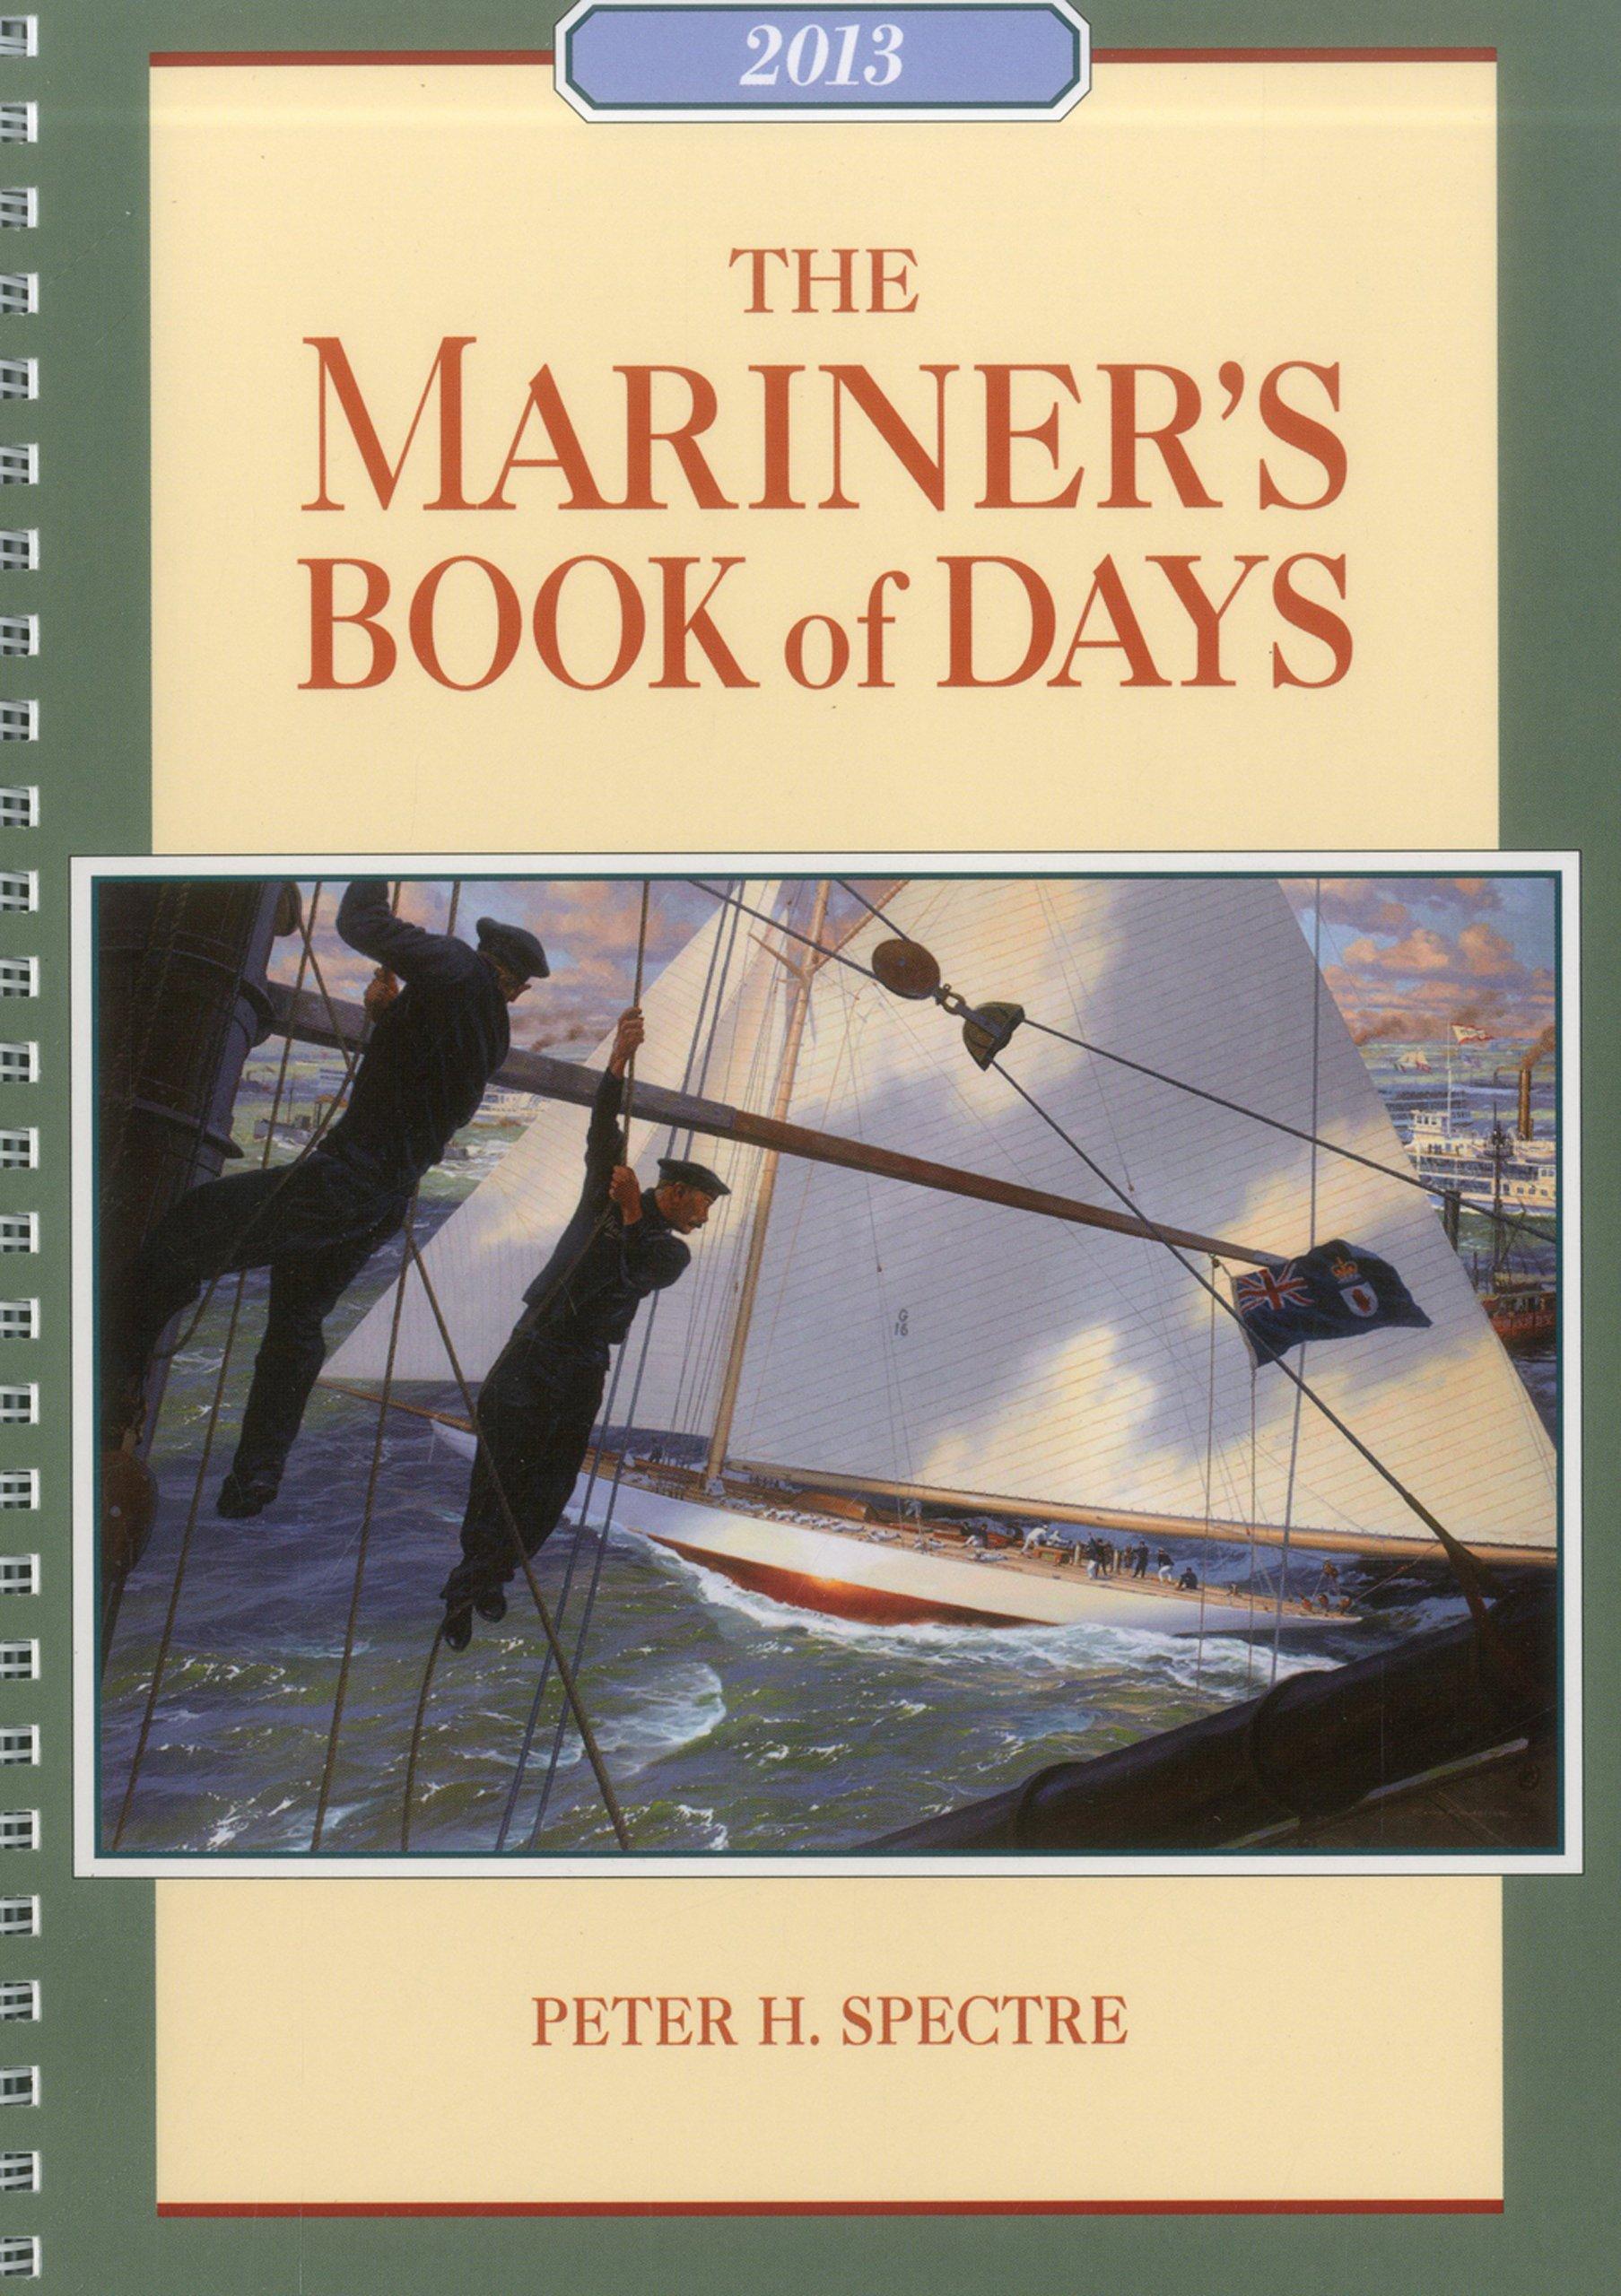 Download Mariner's Book of Days 2013 ebook